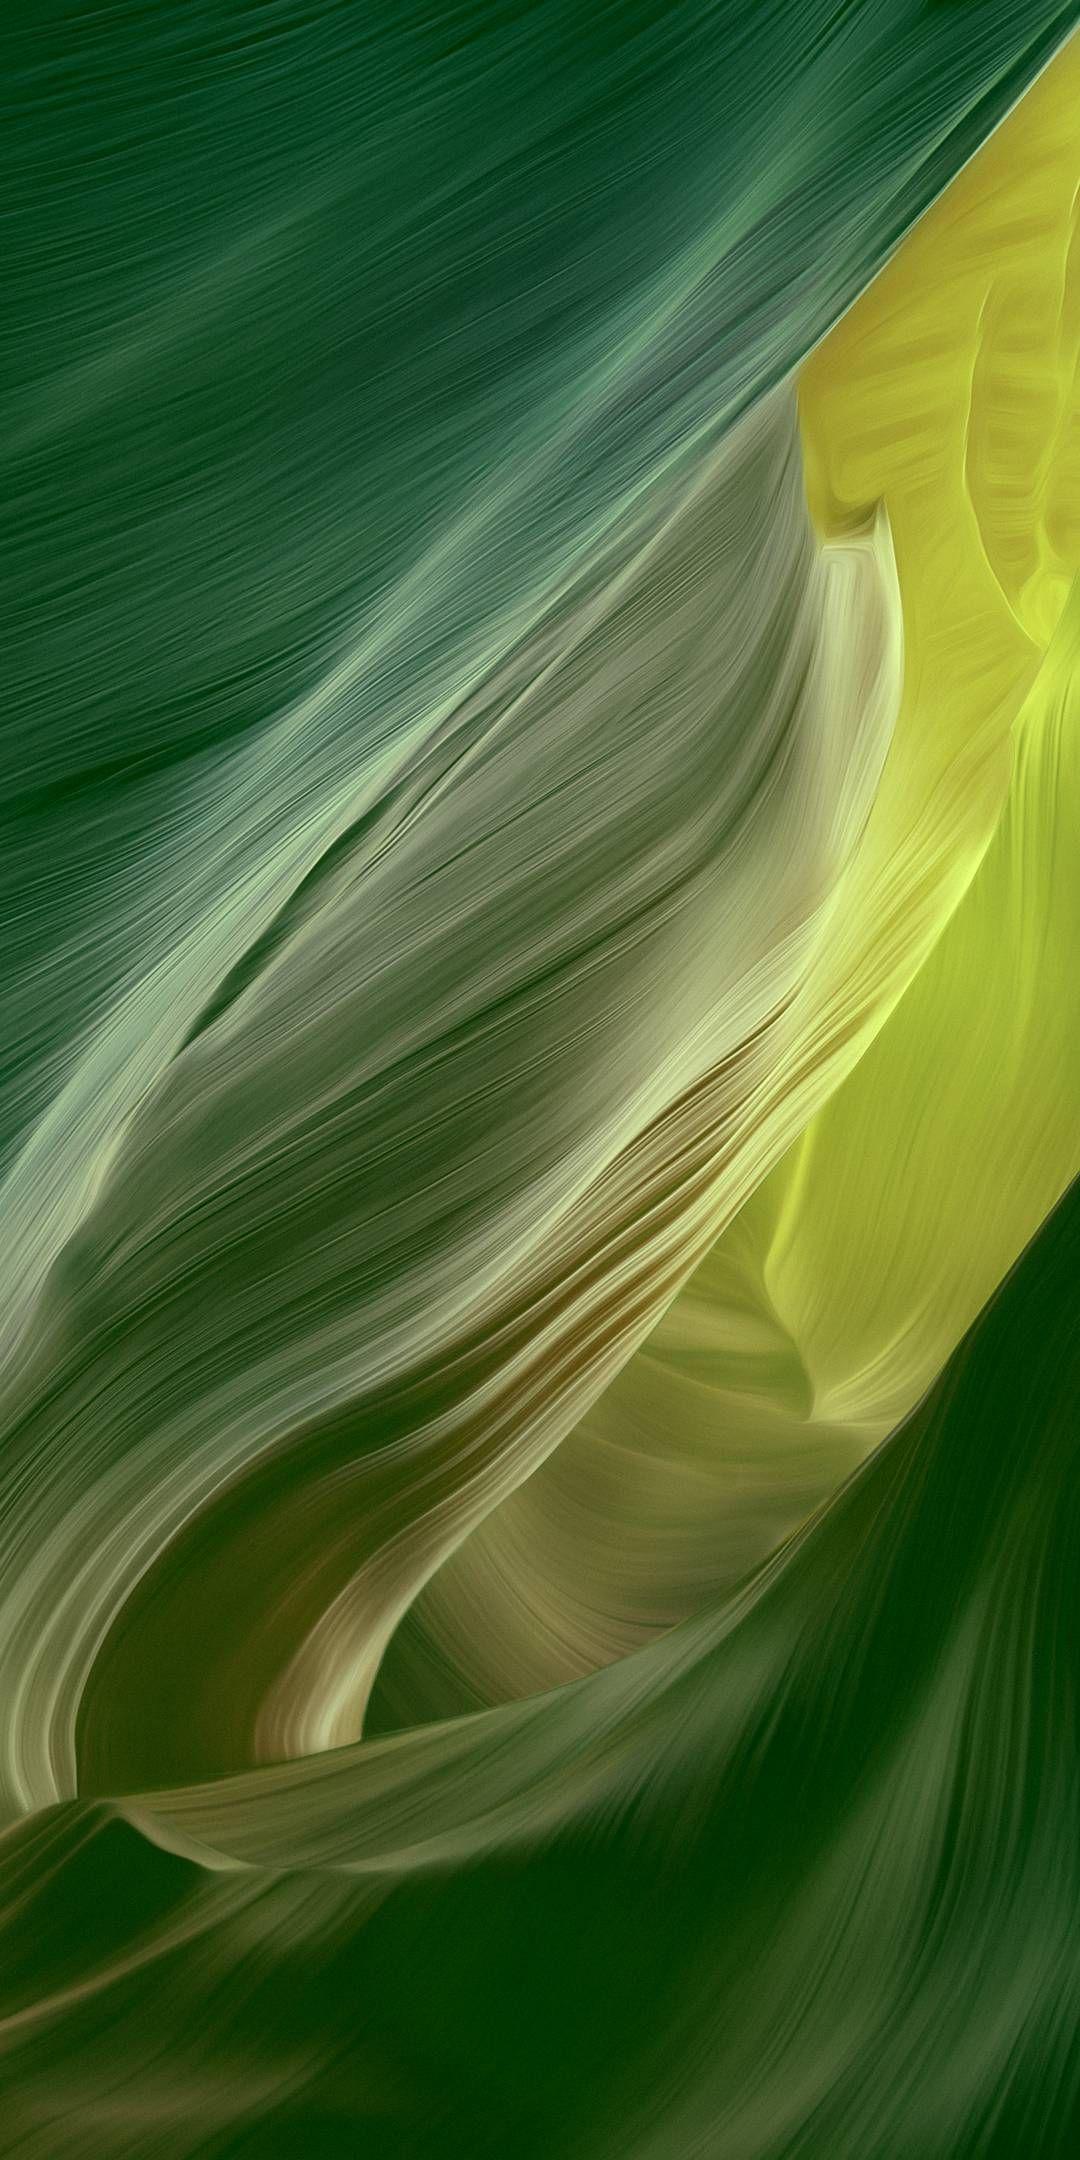 Abstract Nokia 1 3 Wallpaper 1080x2160 Xiaomi Wallpapers Watercolor Wallpaper Iphone Color Wallpaper Iphone